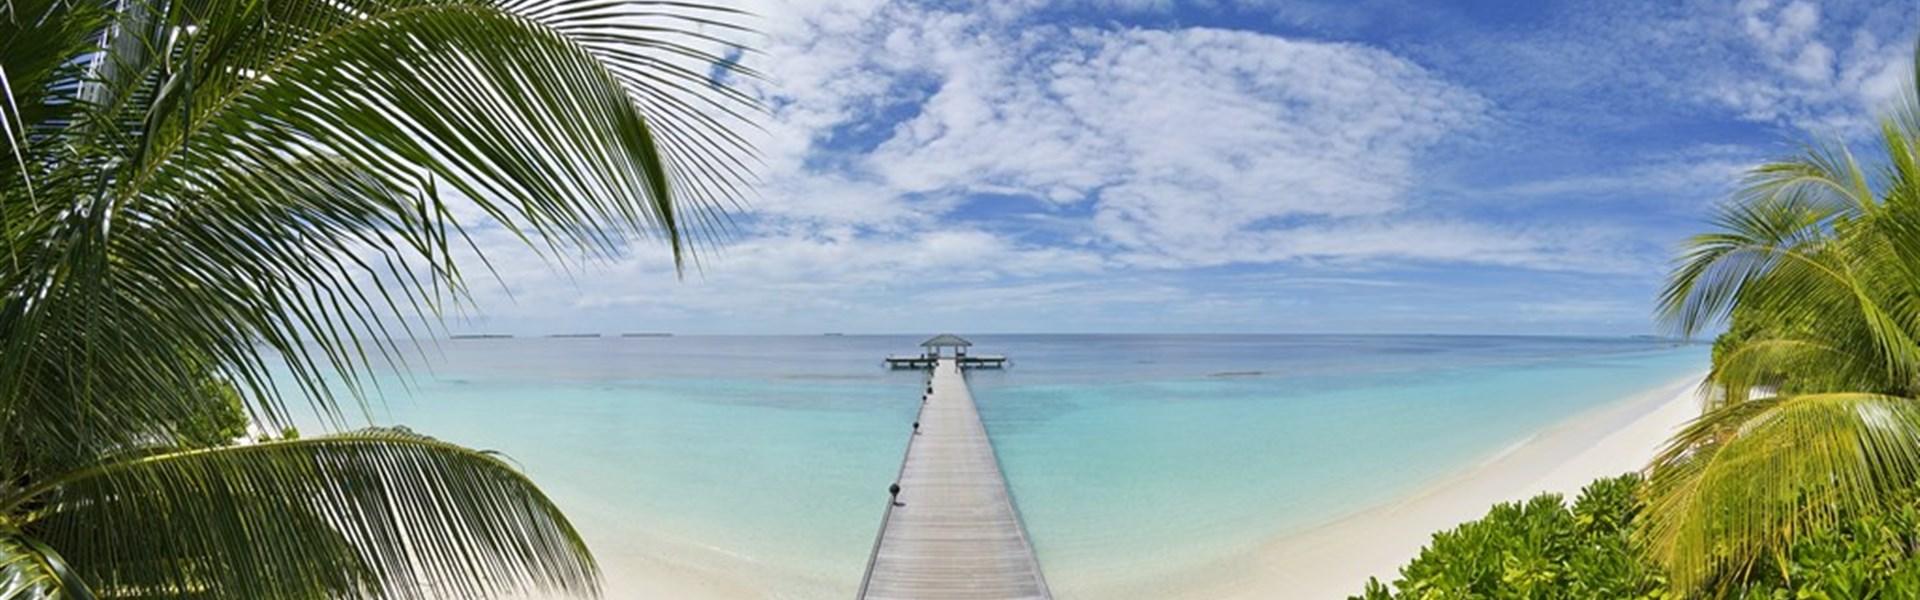 Royal Island Resort & Spa -